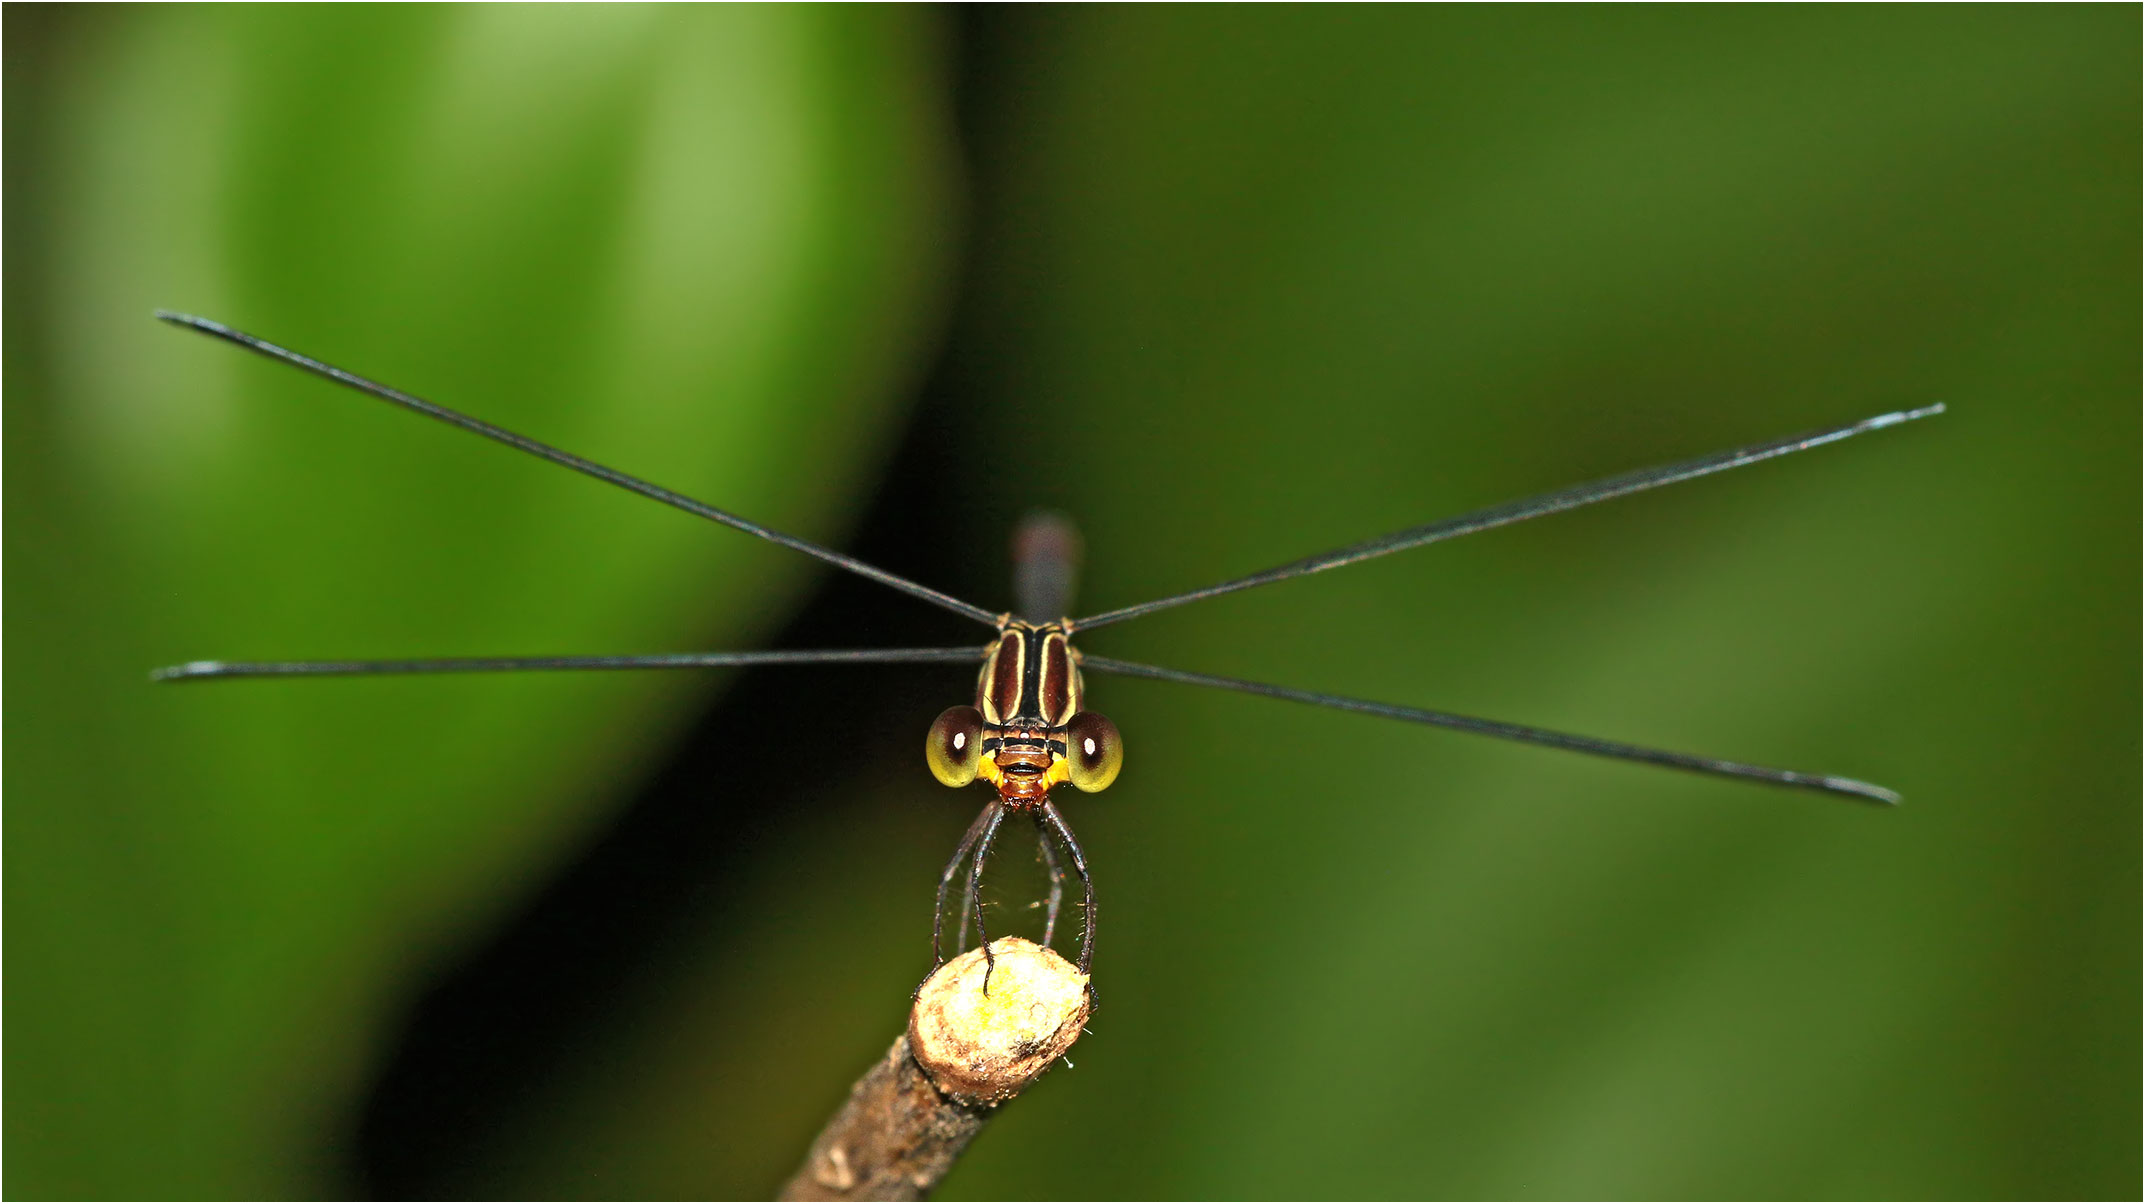 Heteragrion alienum femelle, Mexique, Palenque (Chiapas), 29/10/2019